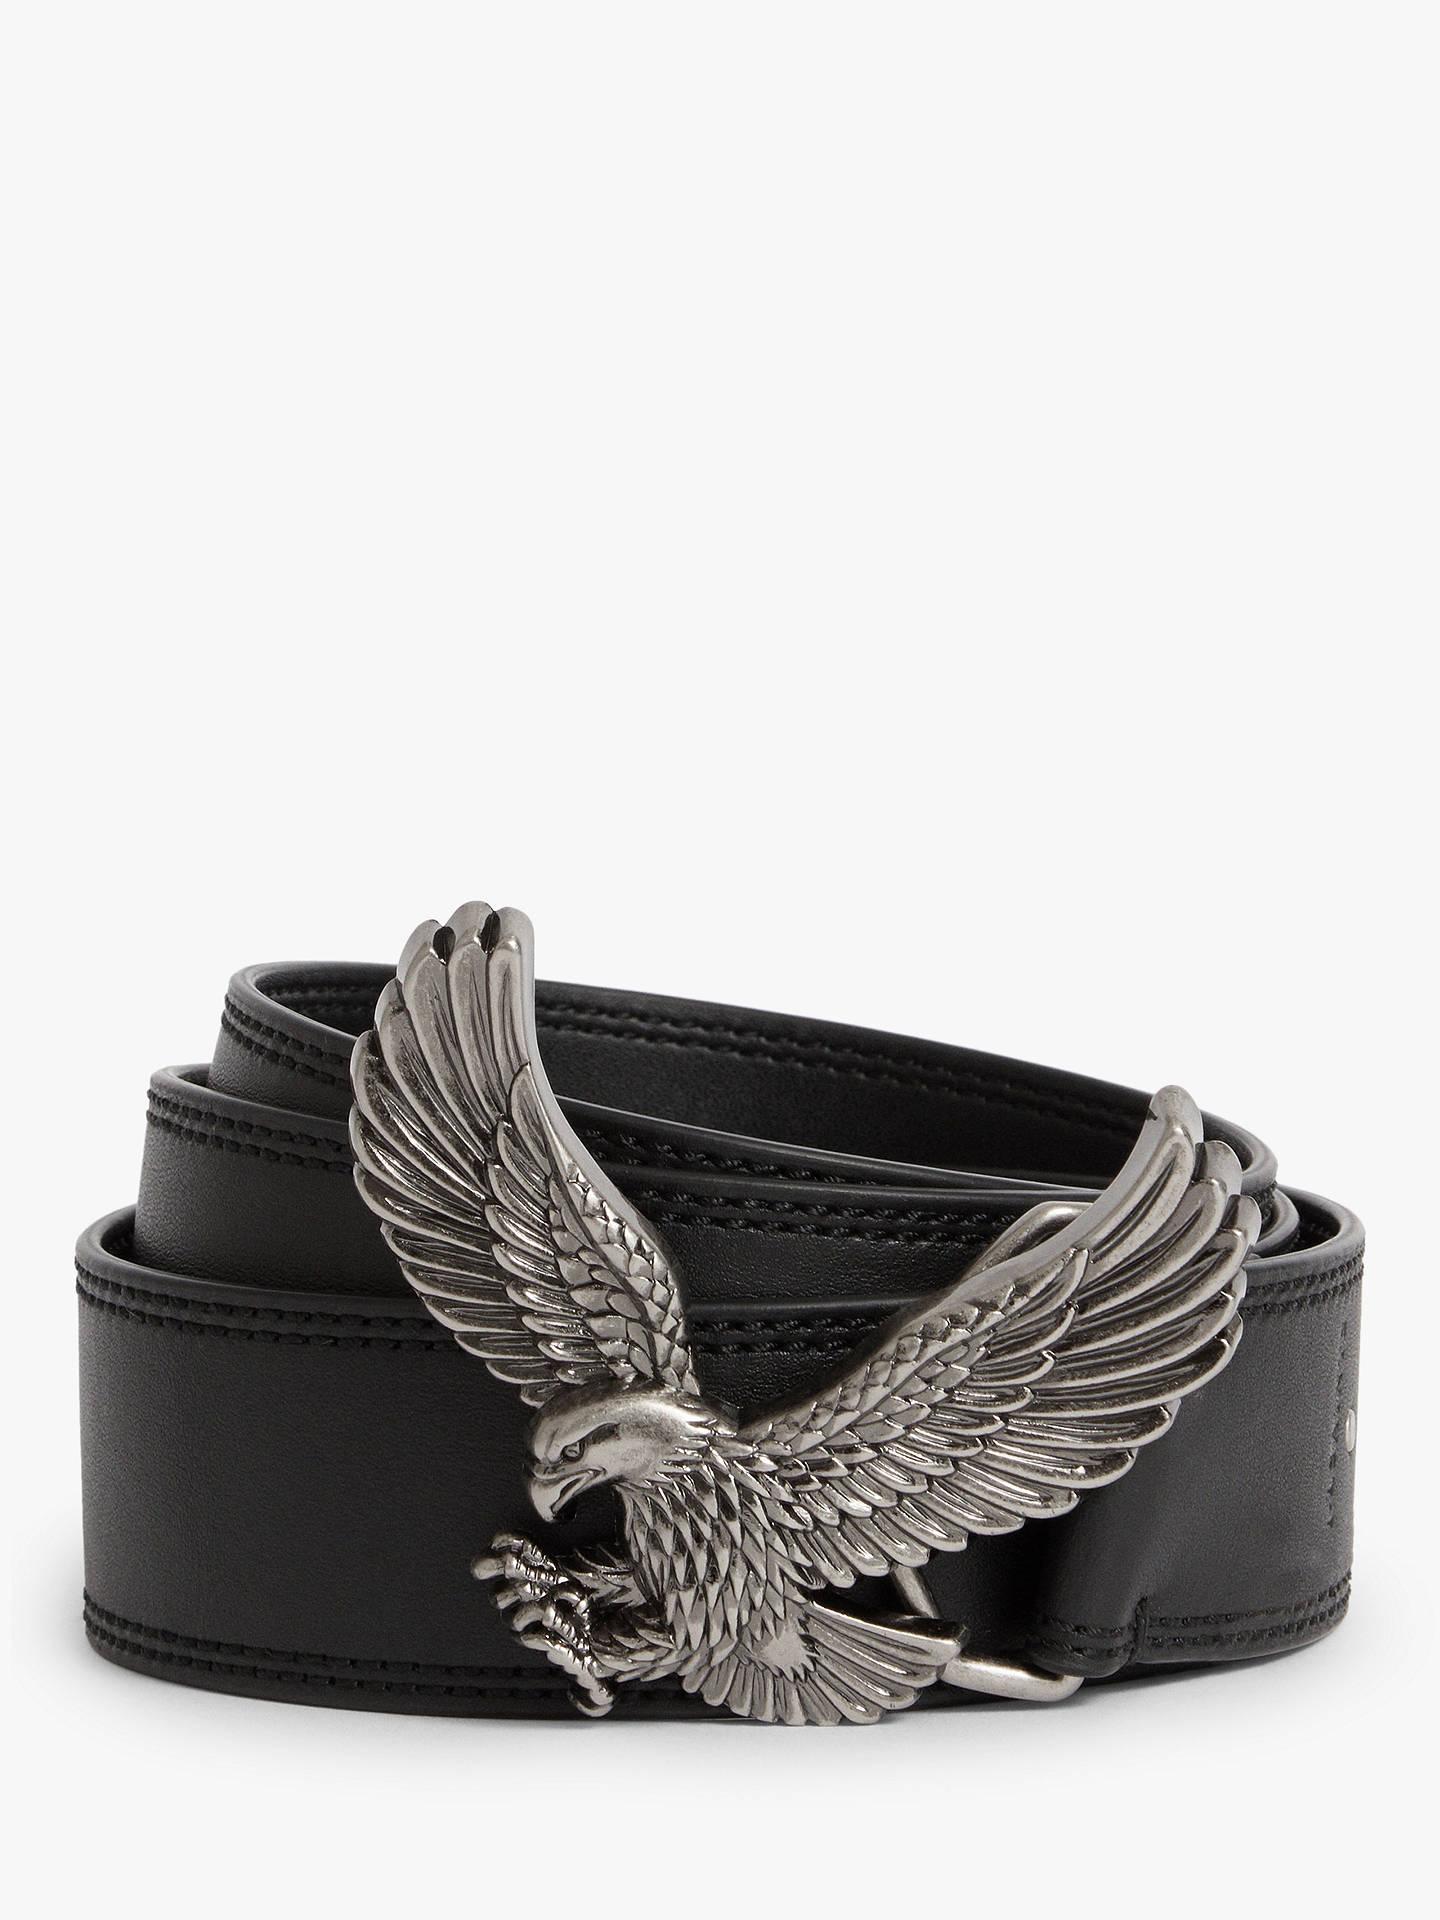 AllSaints Aquilo Eagle Buckle Leather Belt, Black at John